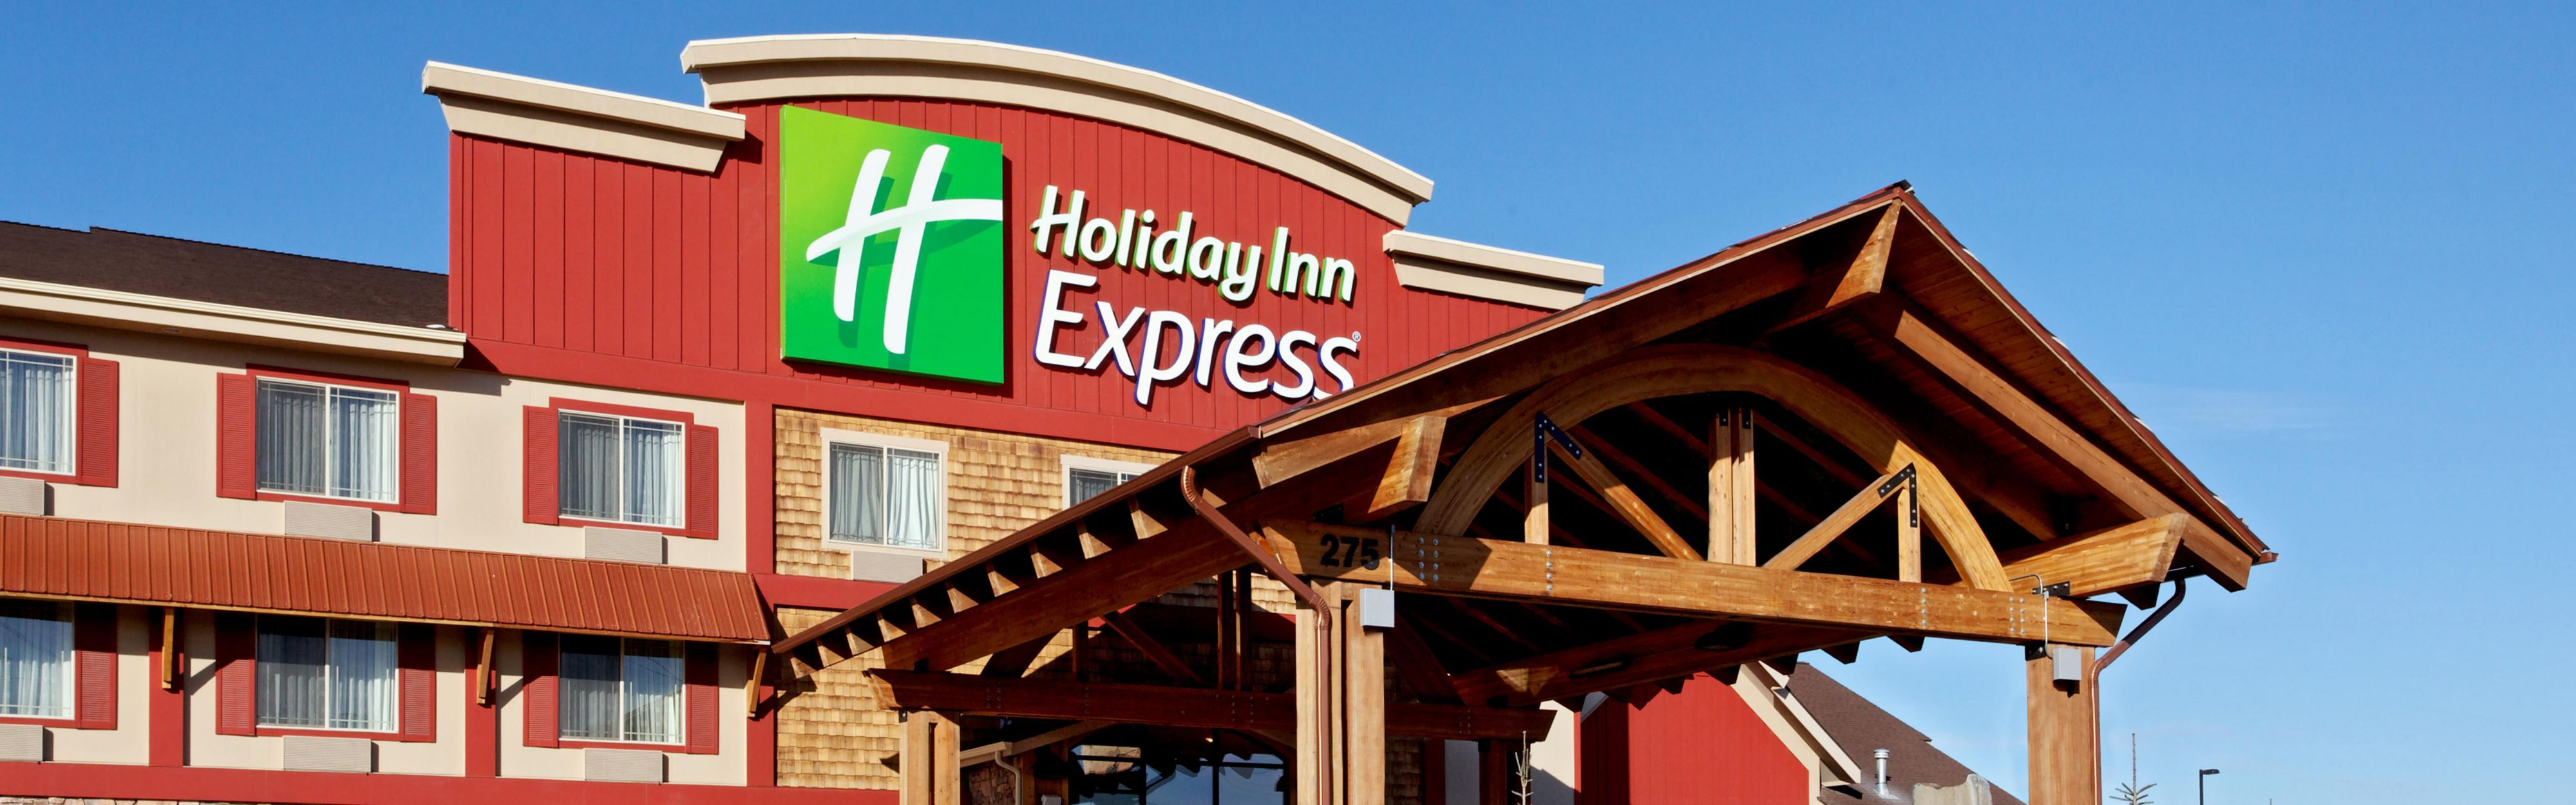 Holiday inn express kalispell coupons